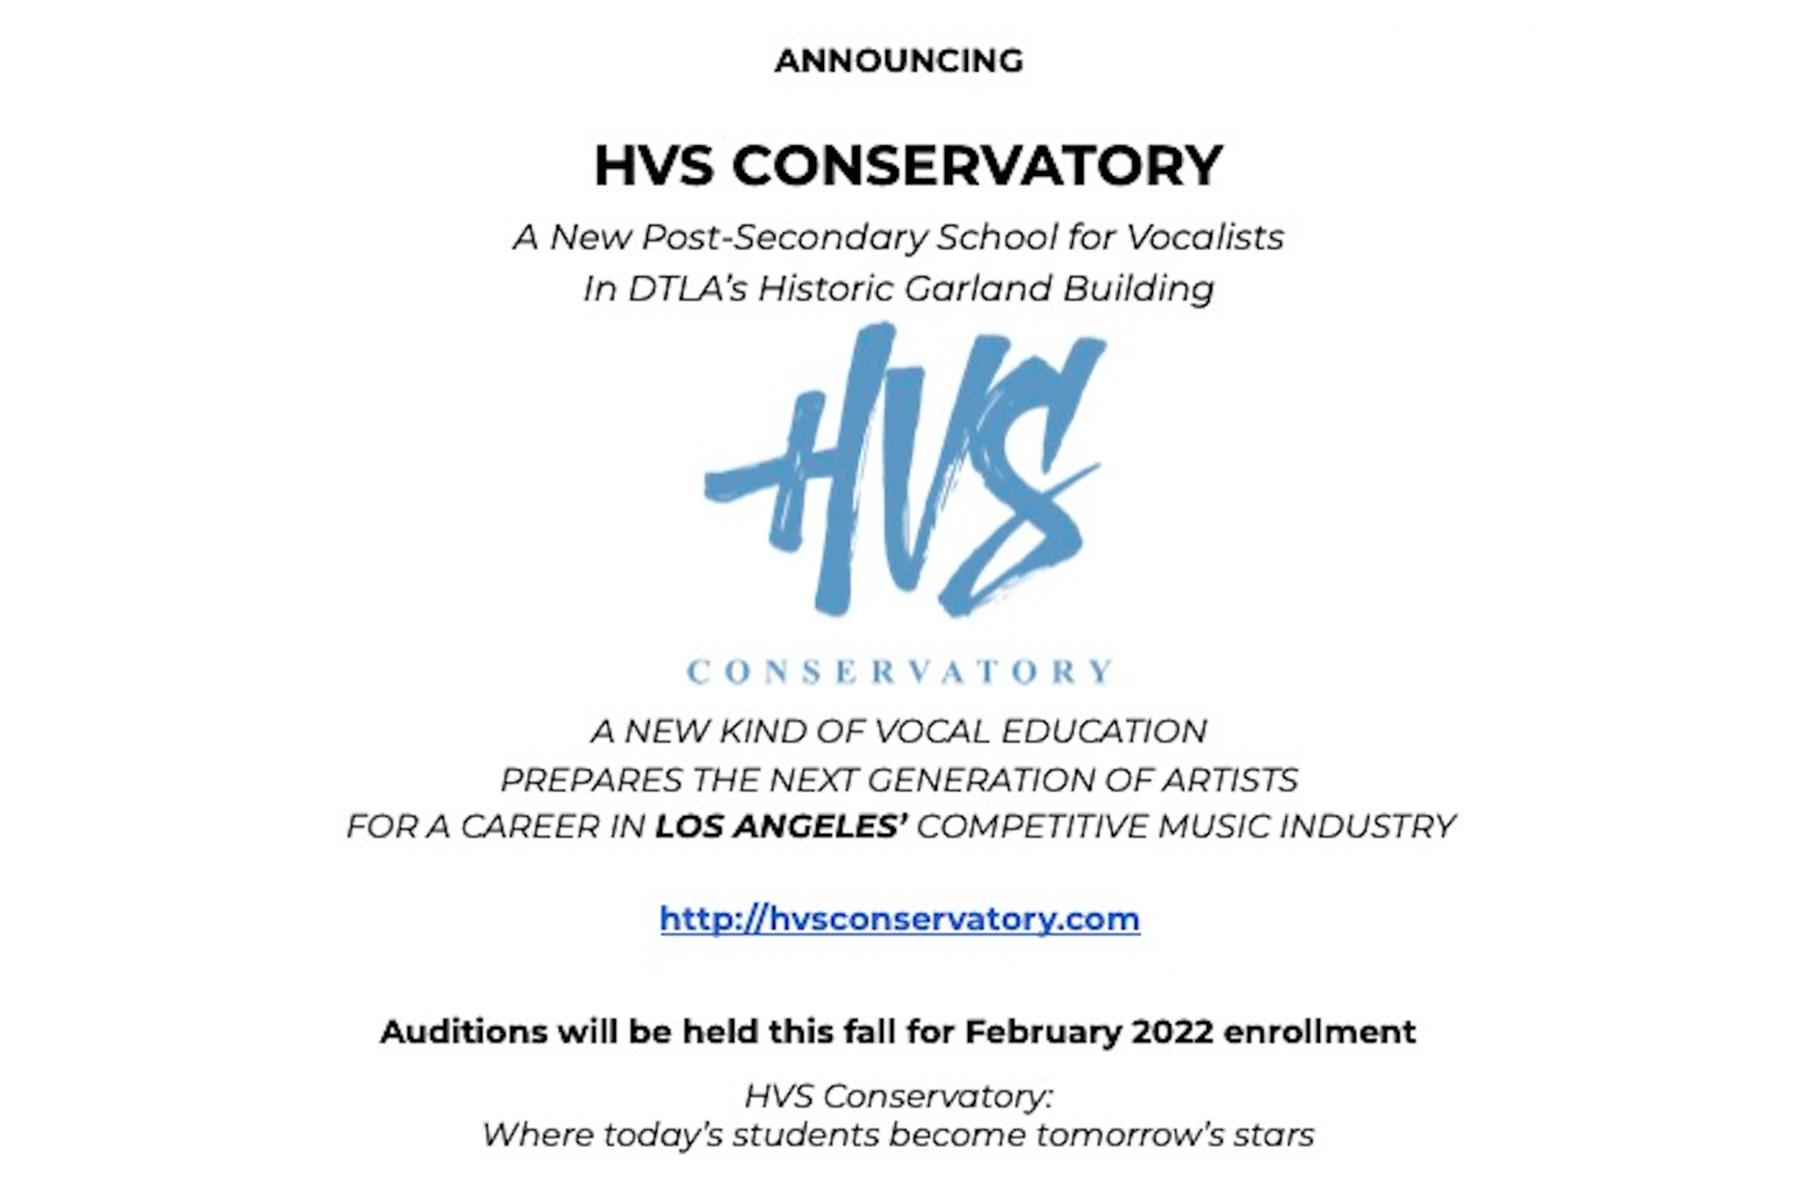 Announcing HVS Conservatory